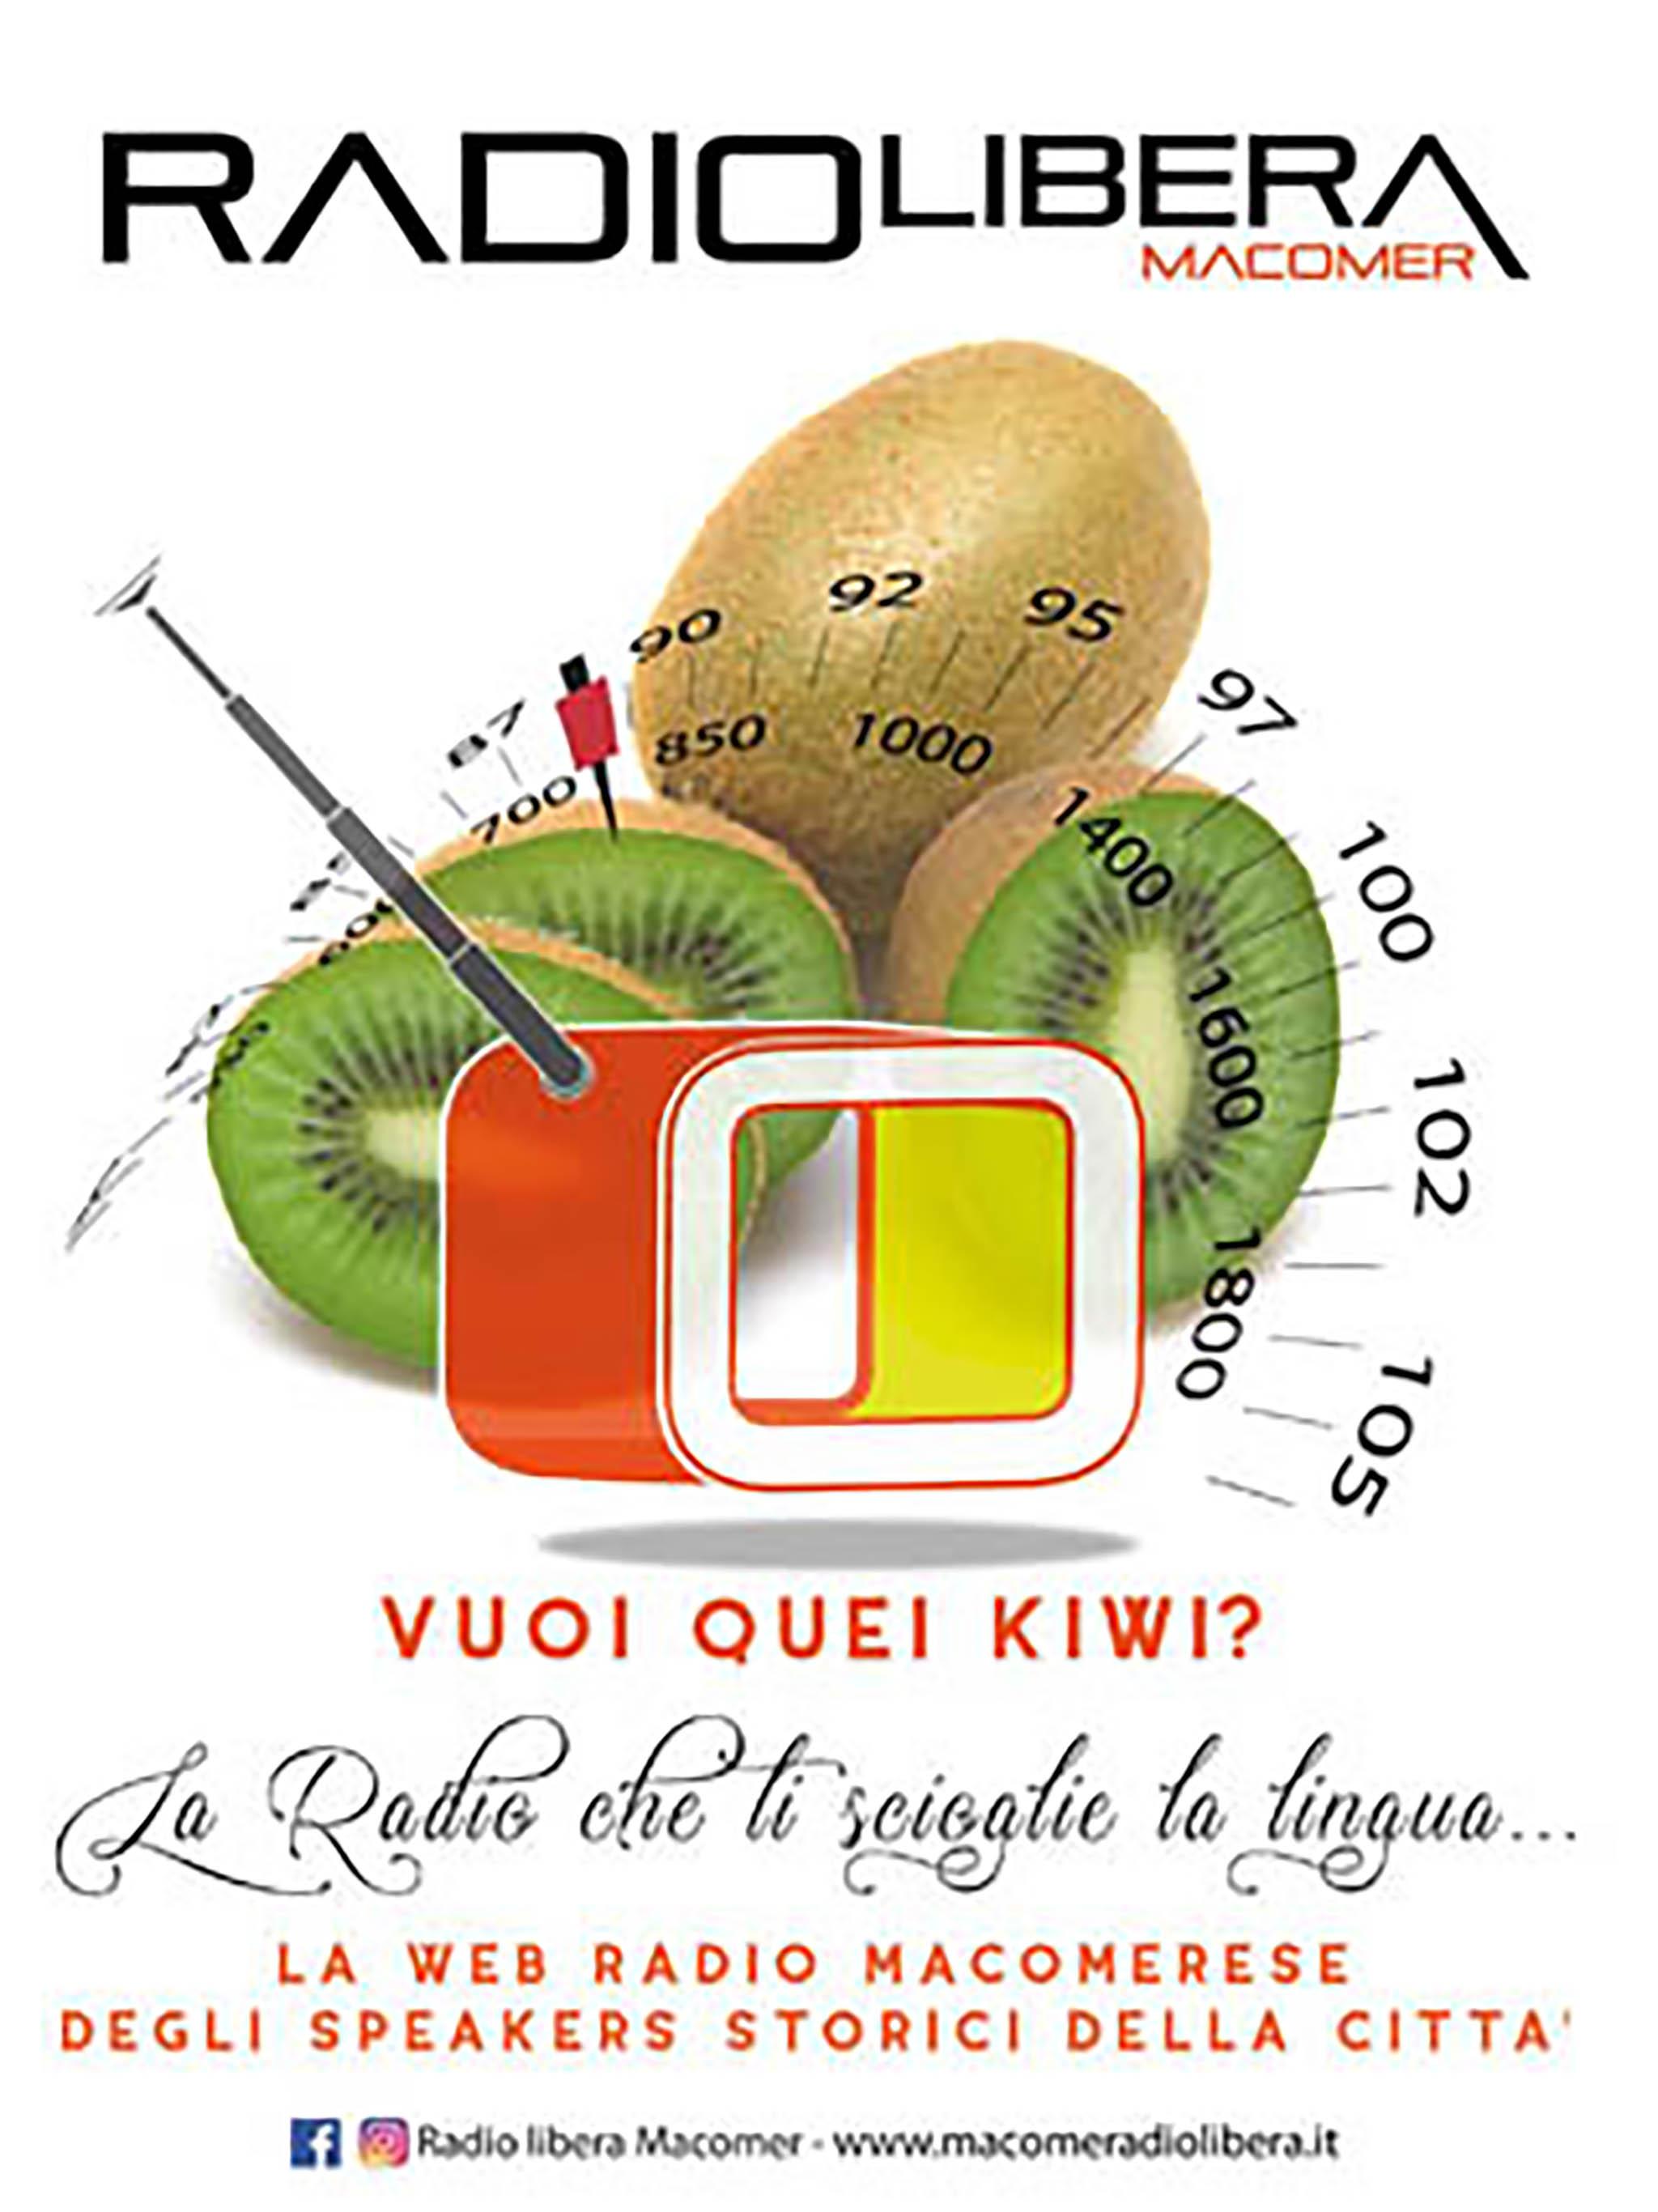 Radio Libera Macomer